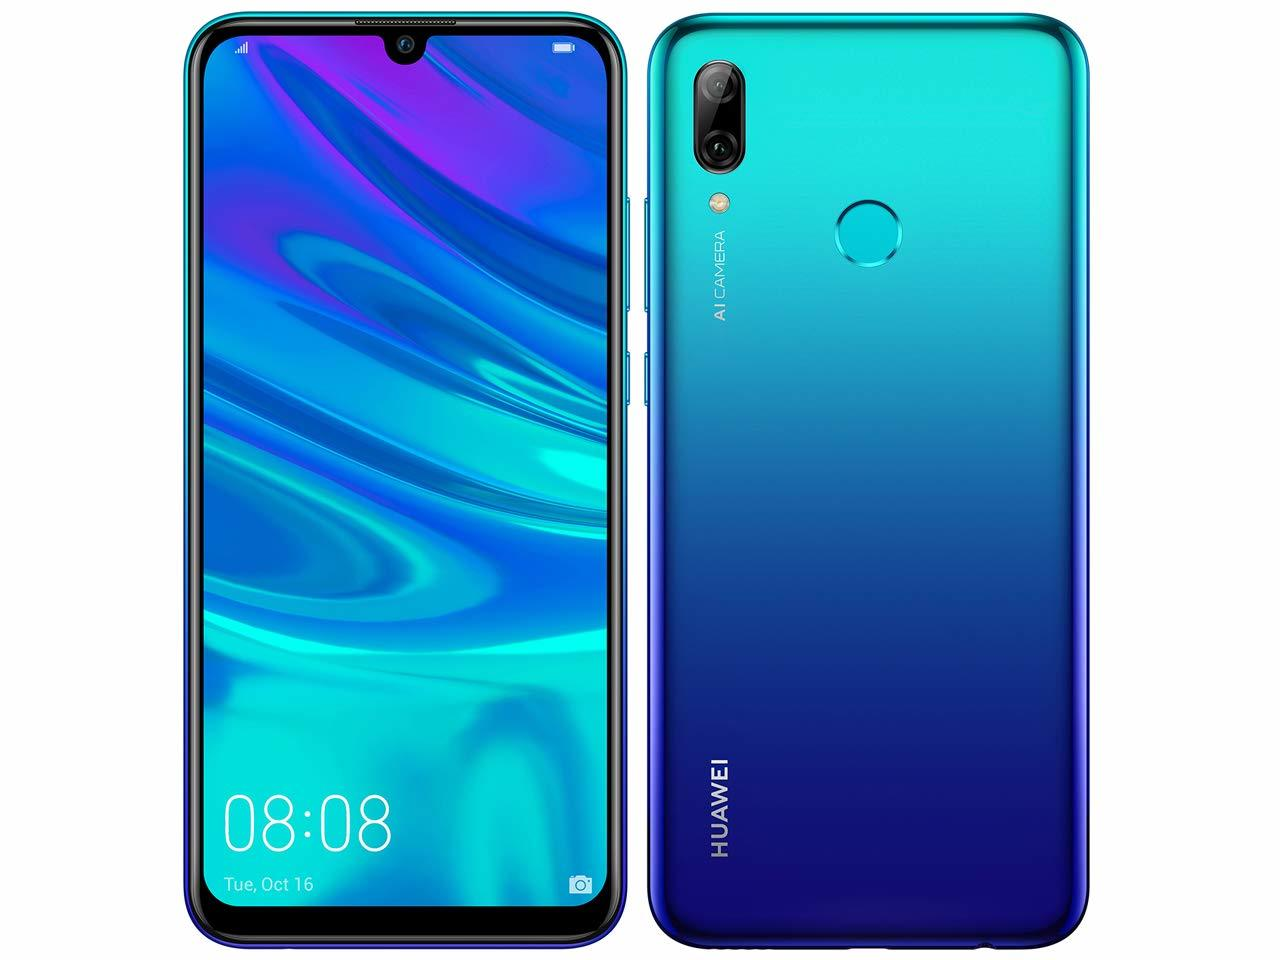 「新品・未使用品」UQ版 Huawei nova lite 3 blue ブルー [hwu35][POT-LX2J][simフリースマホ]